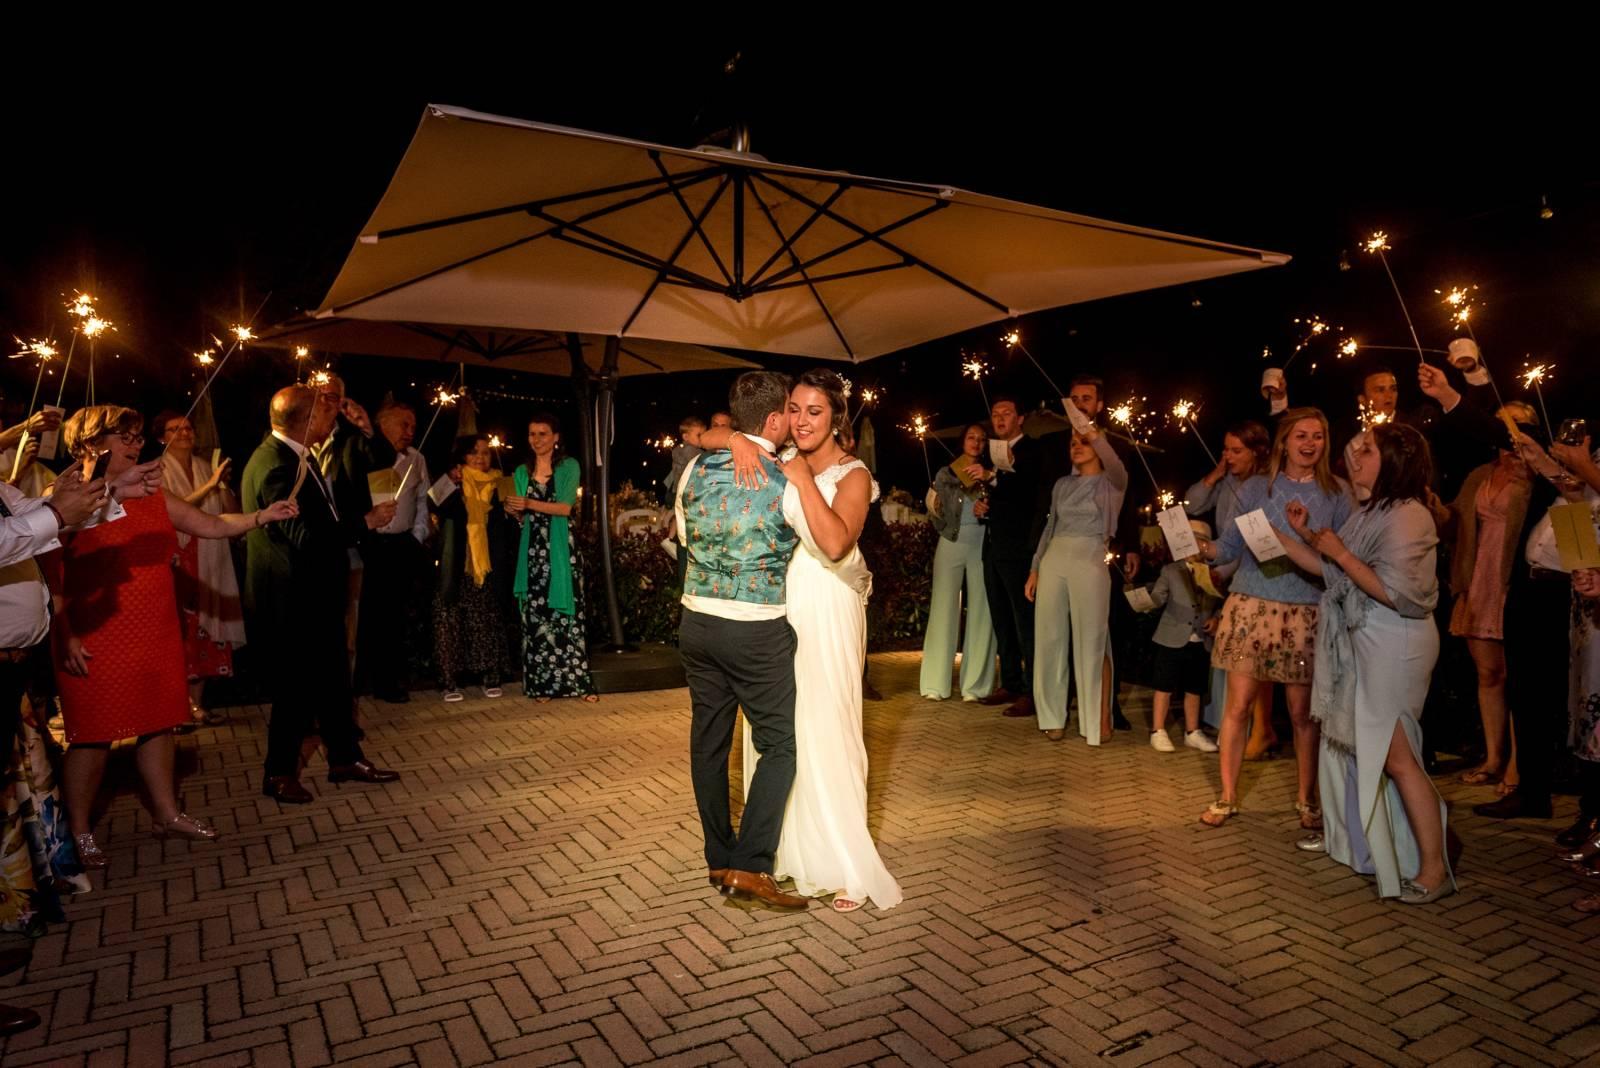 Fotografie Melody - Huwelijksfotograaf - Trouwfotograaf - House of Weddings - 17